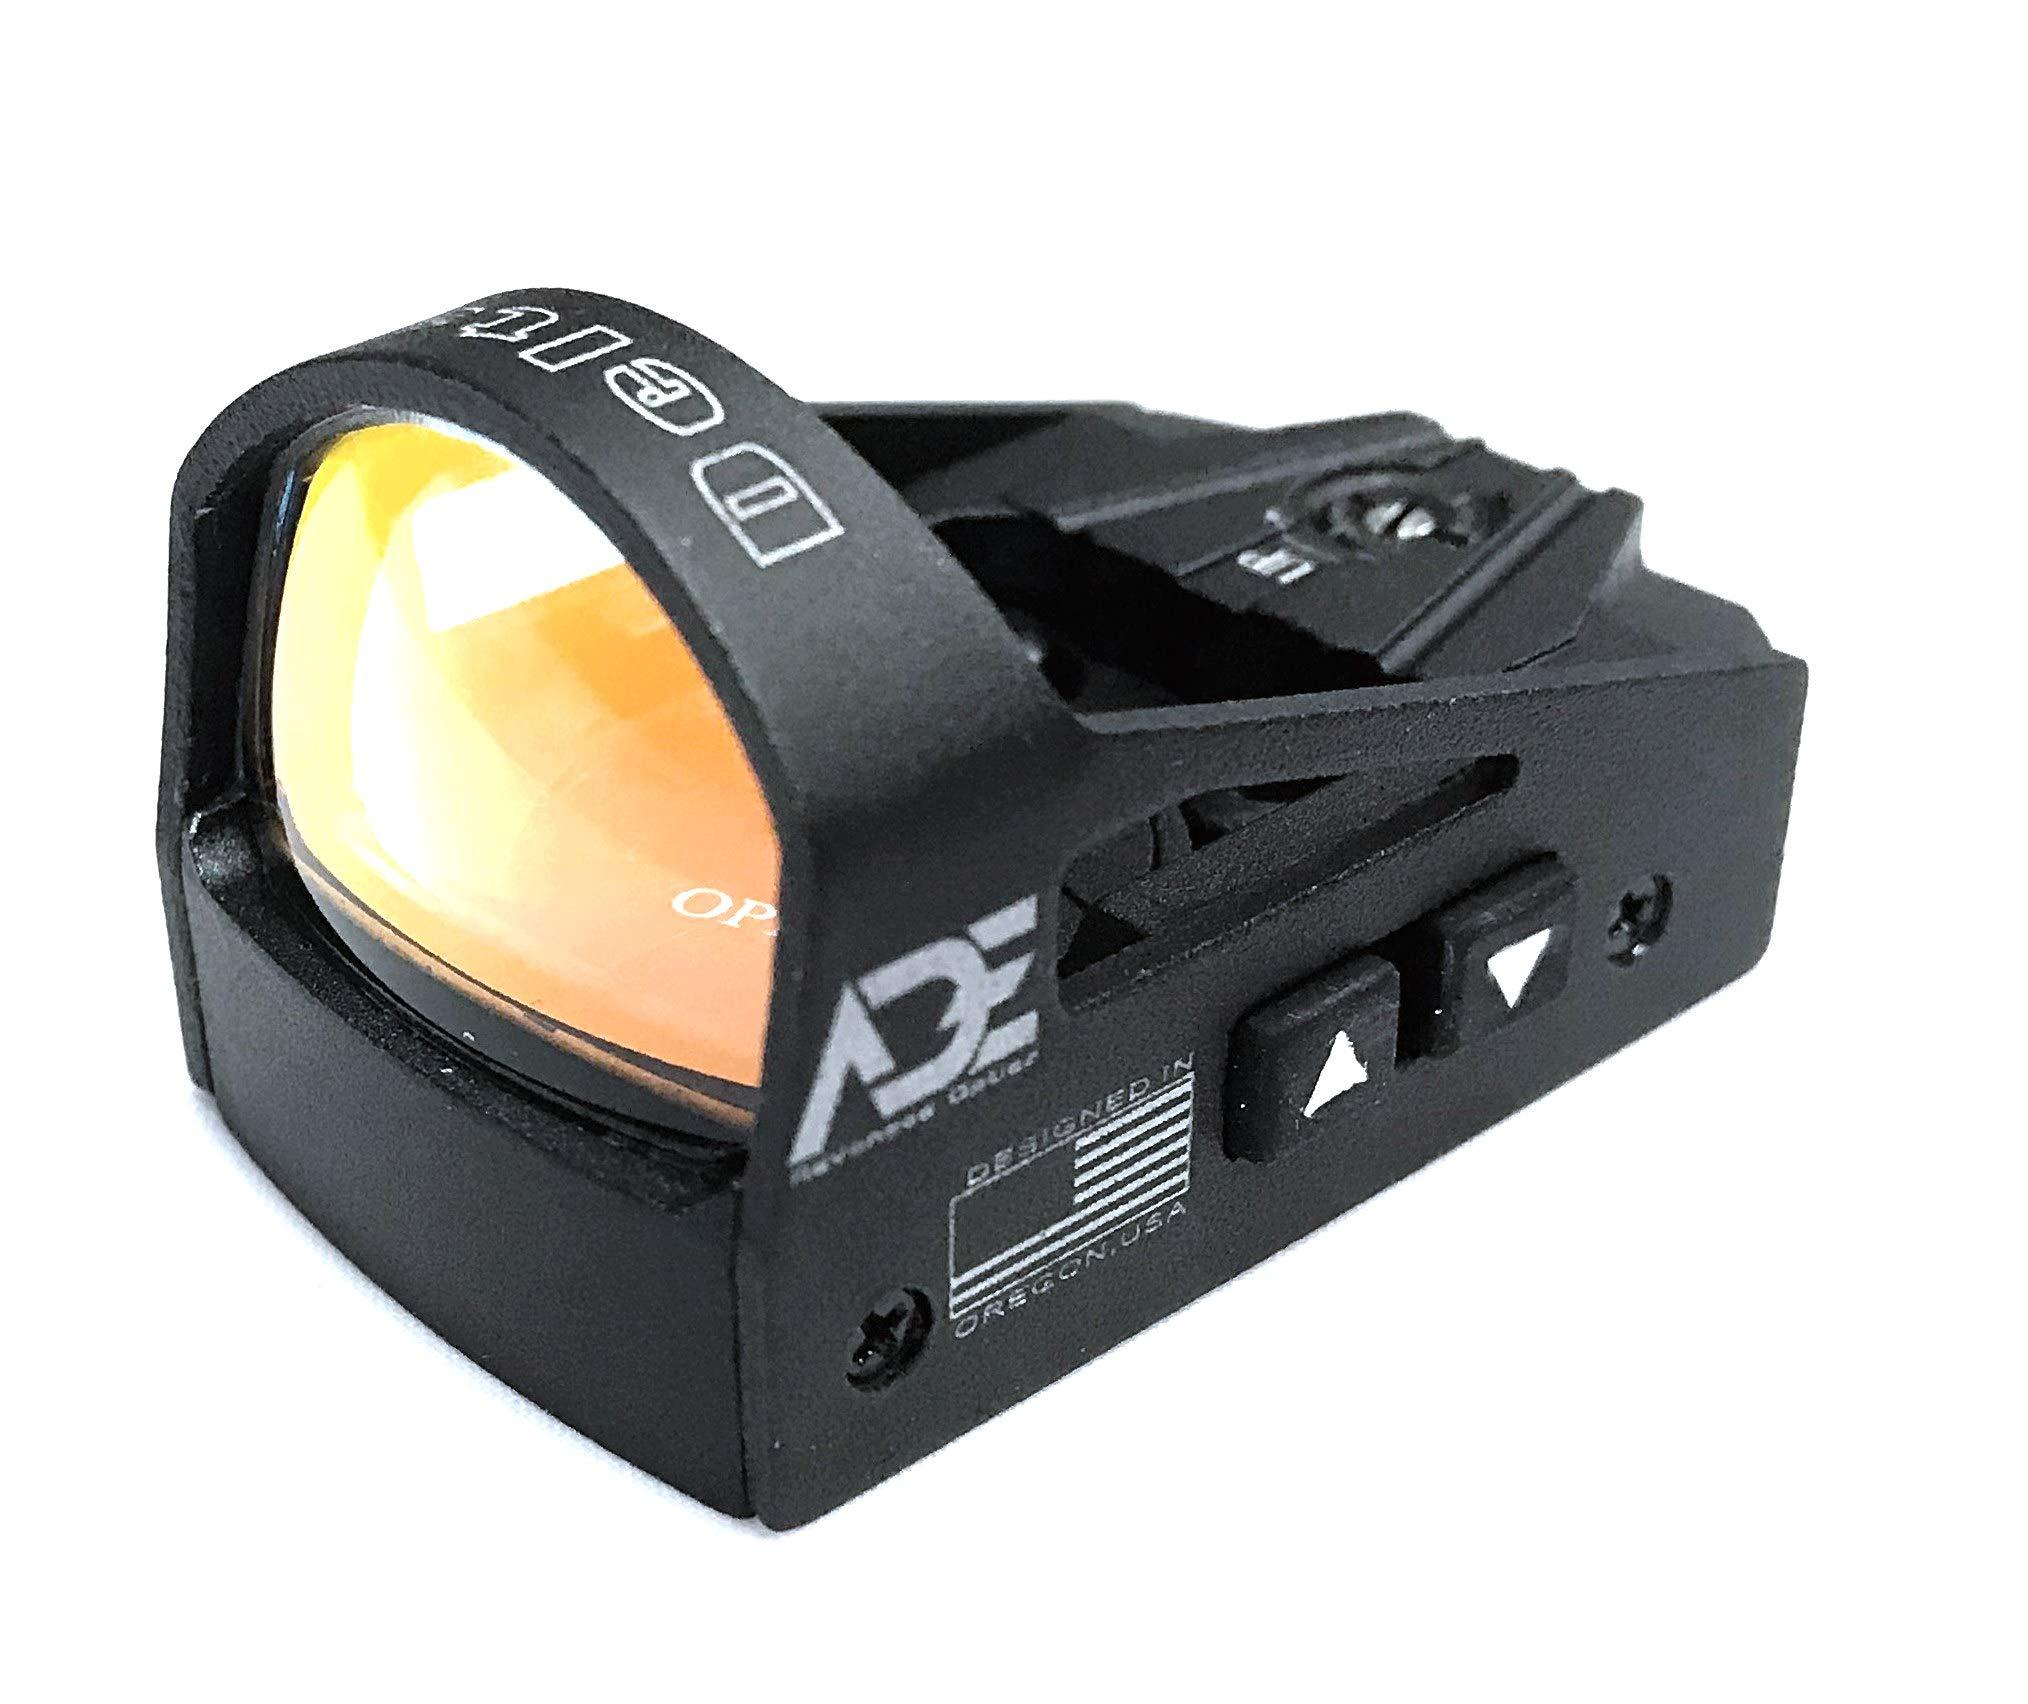 Ade RD3-012-G-GREEN Dot Reflex Sight for Springfield XDM XD-M OSP System Pistol Handgun by Ade Advanced Optics